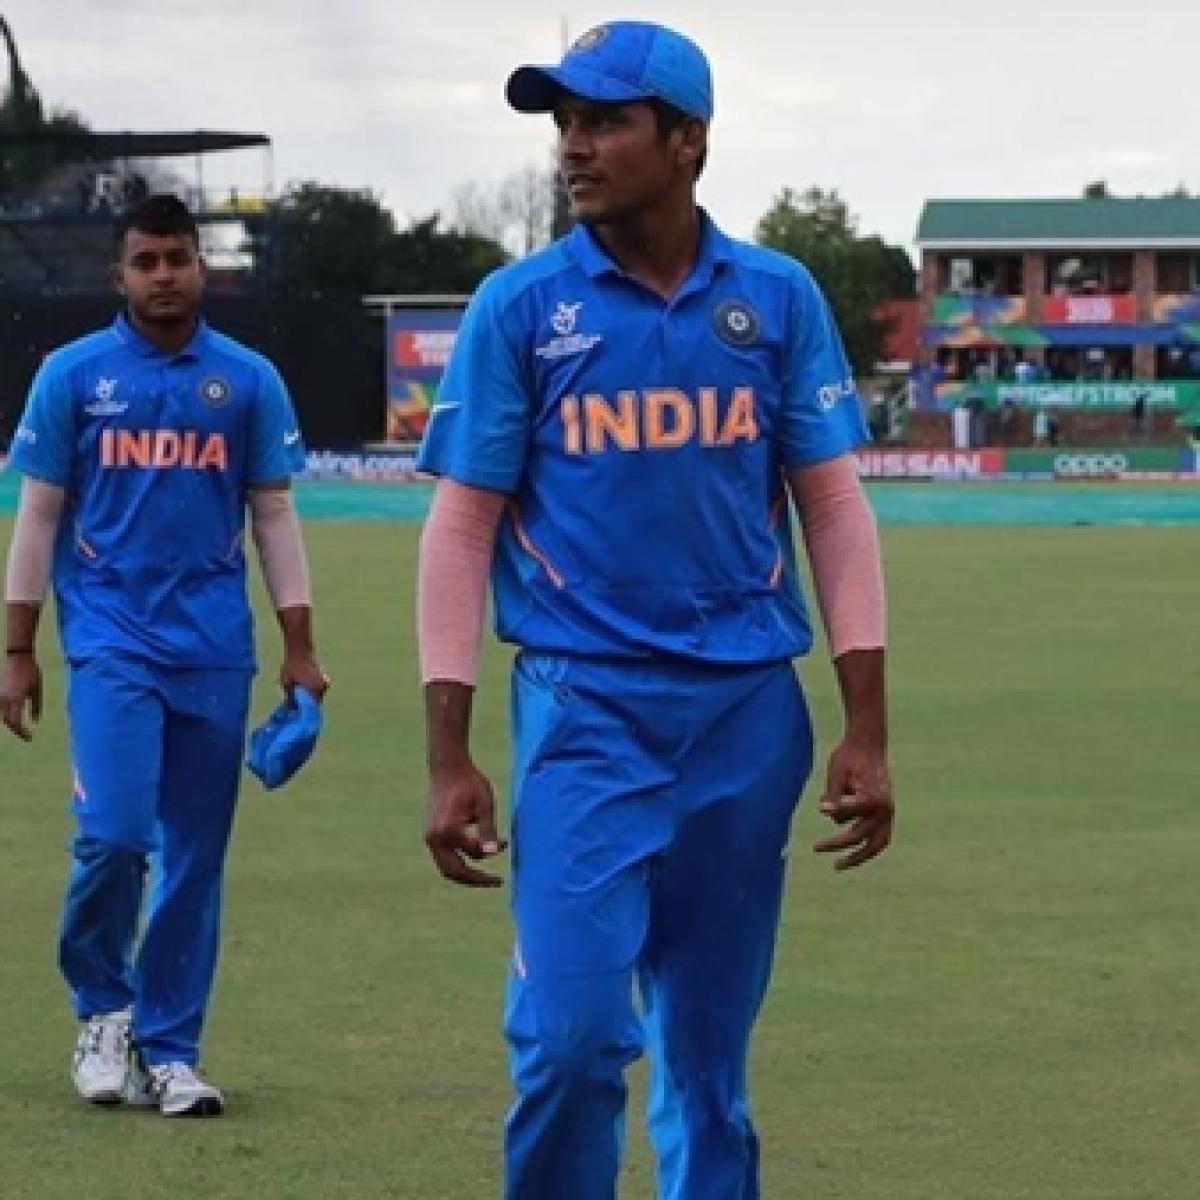 India skipper Priyam Garg says Bangladesh's reaction was 'dirty' following U-19 triumph